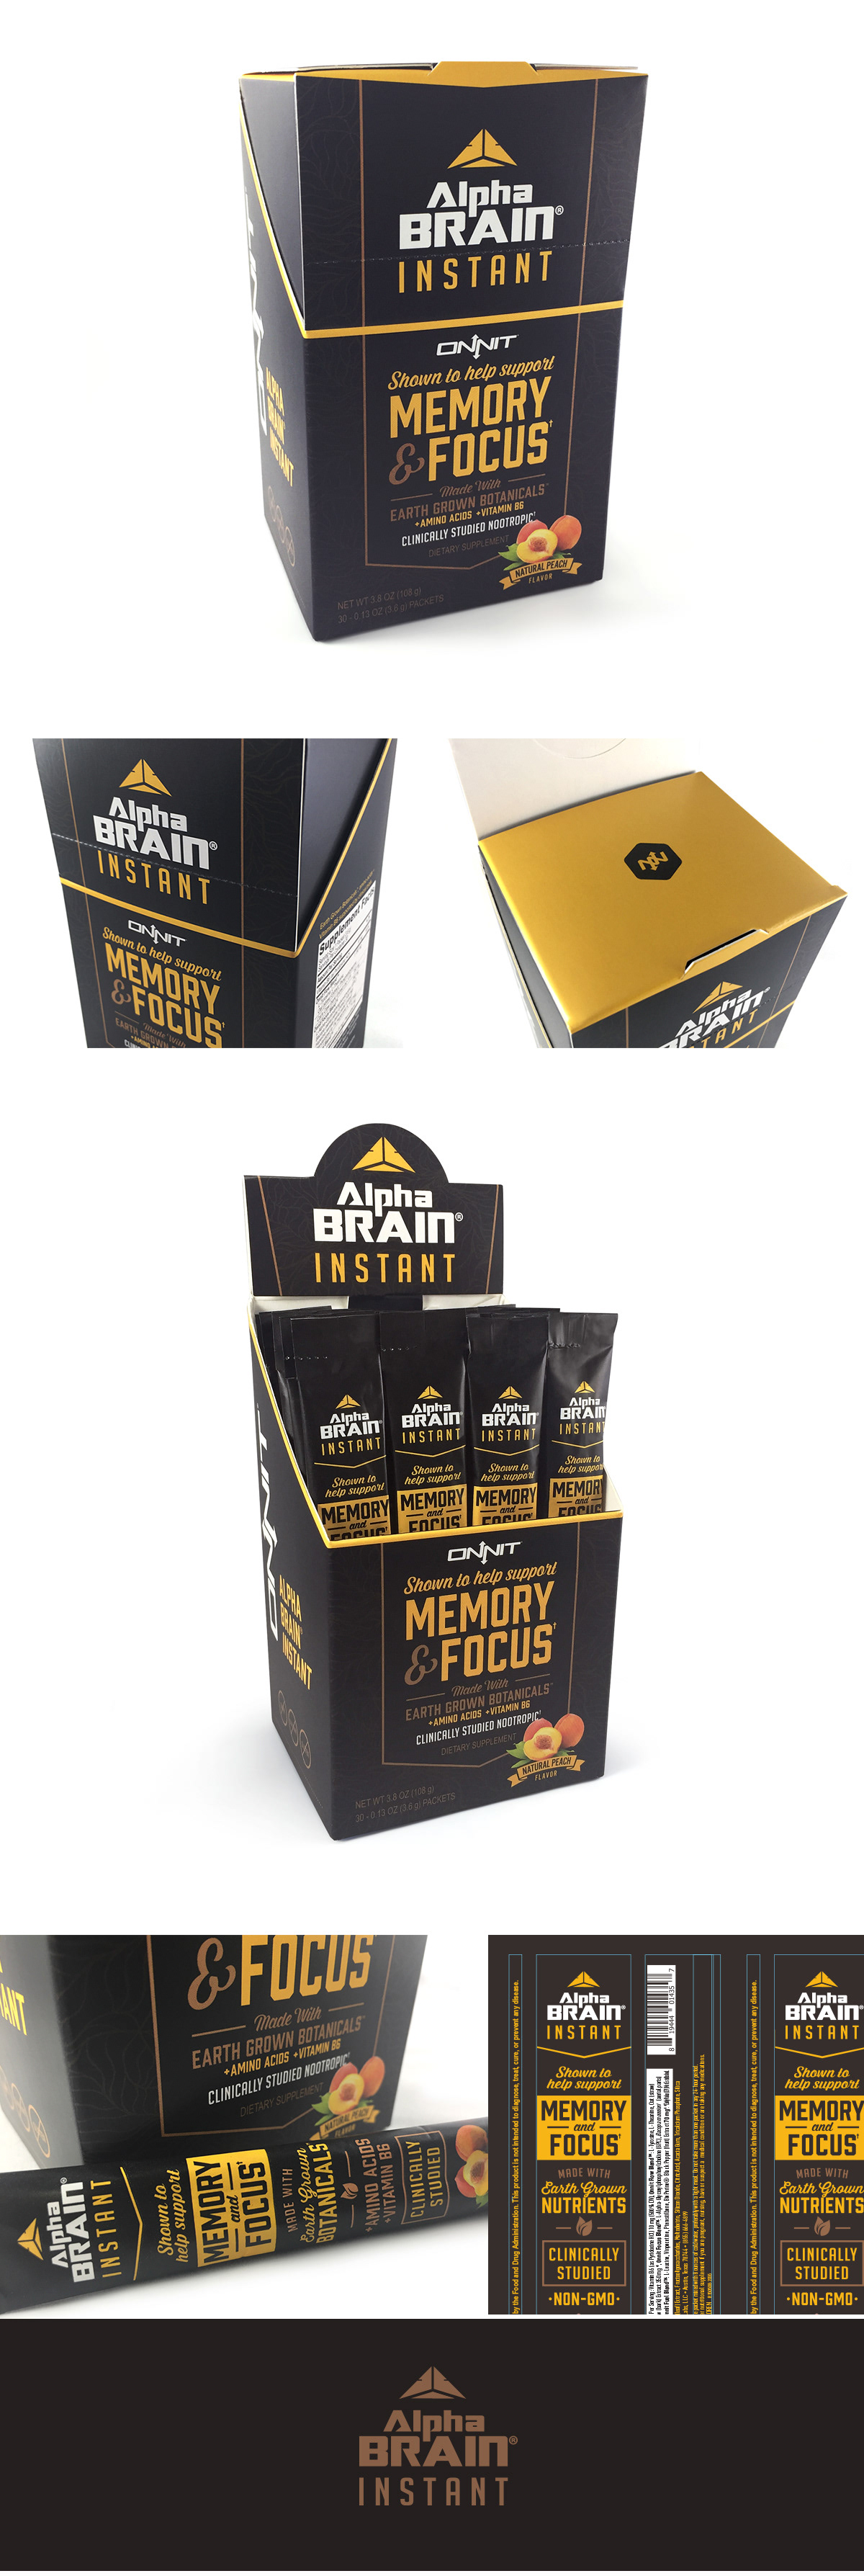 Arthur Fury Design Packaging